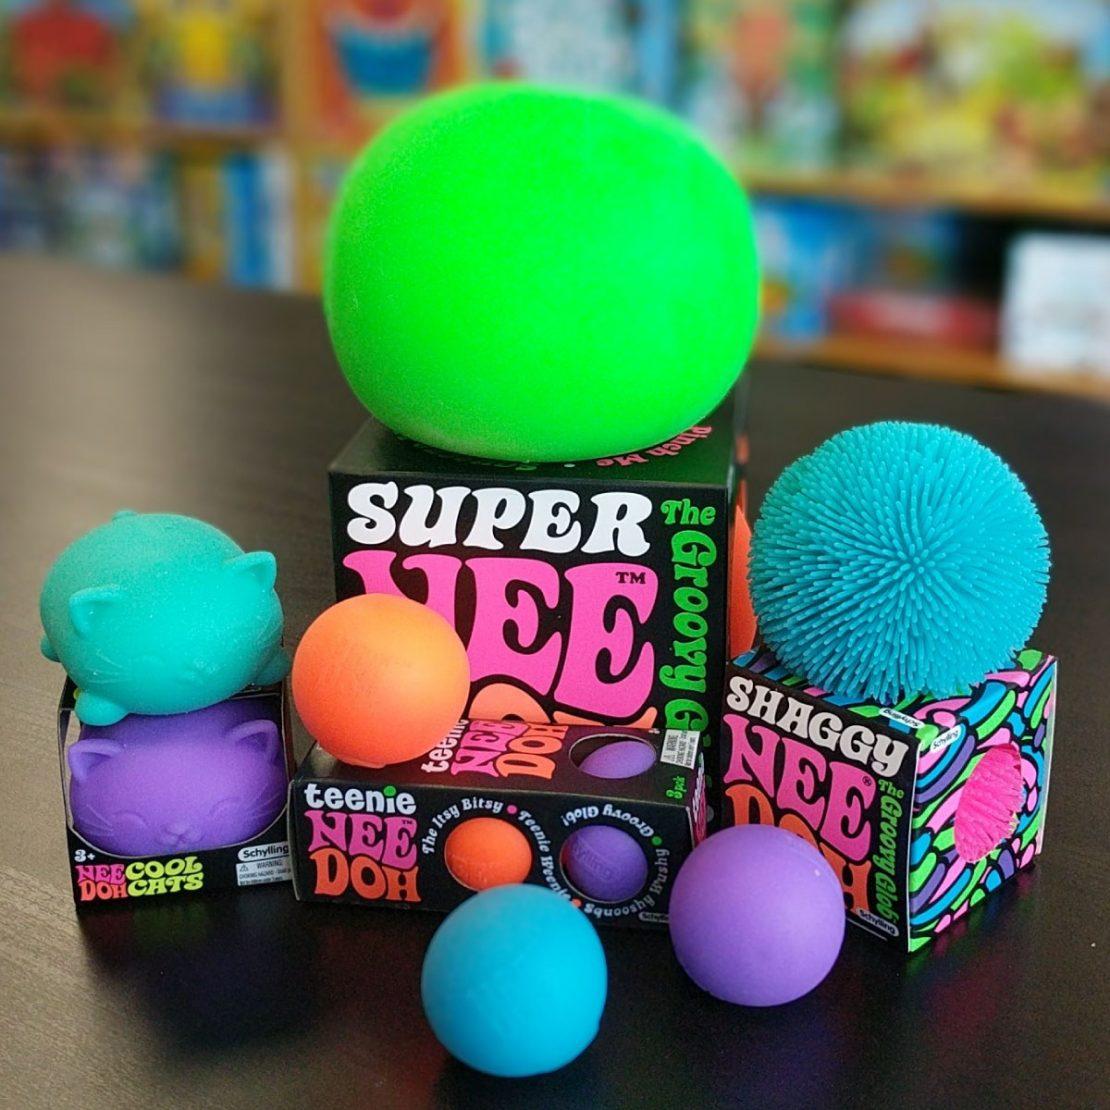 Nee-Doh Stress Balls